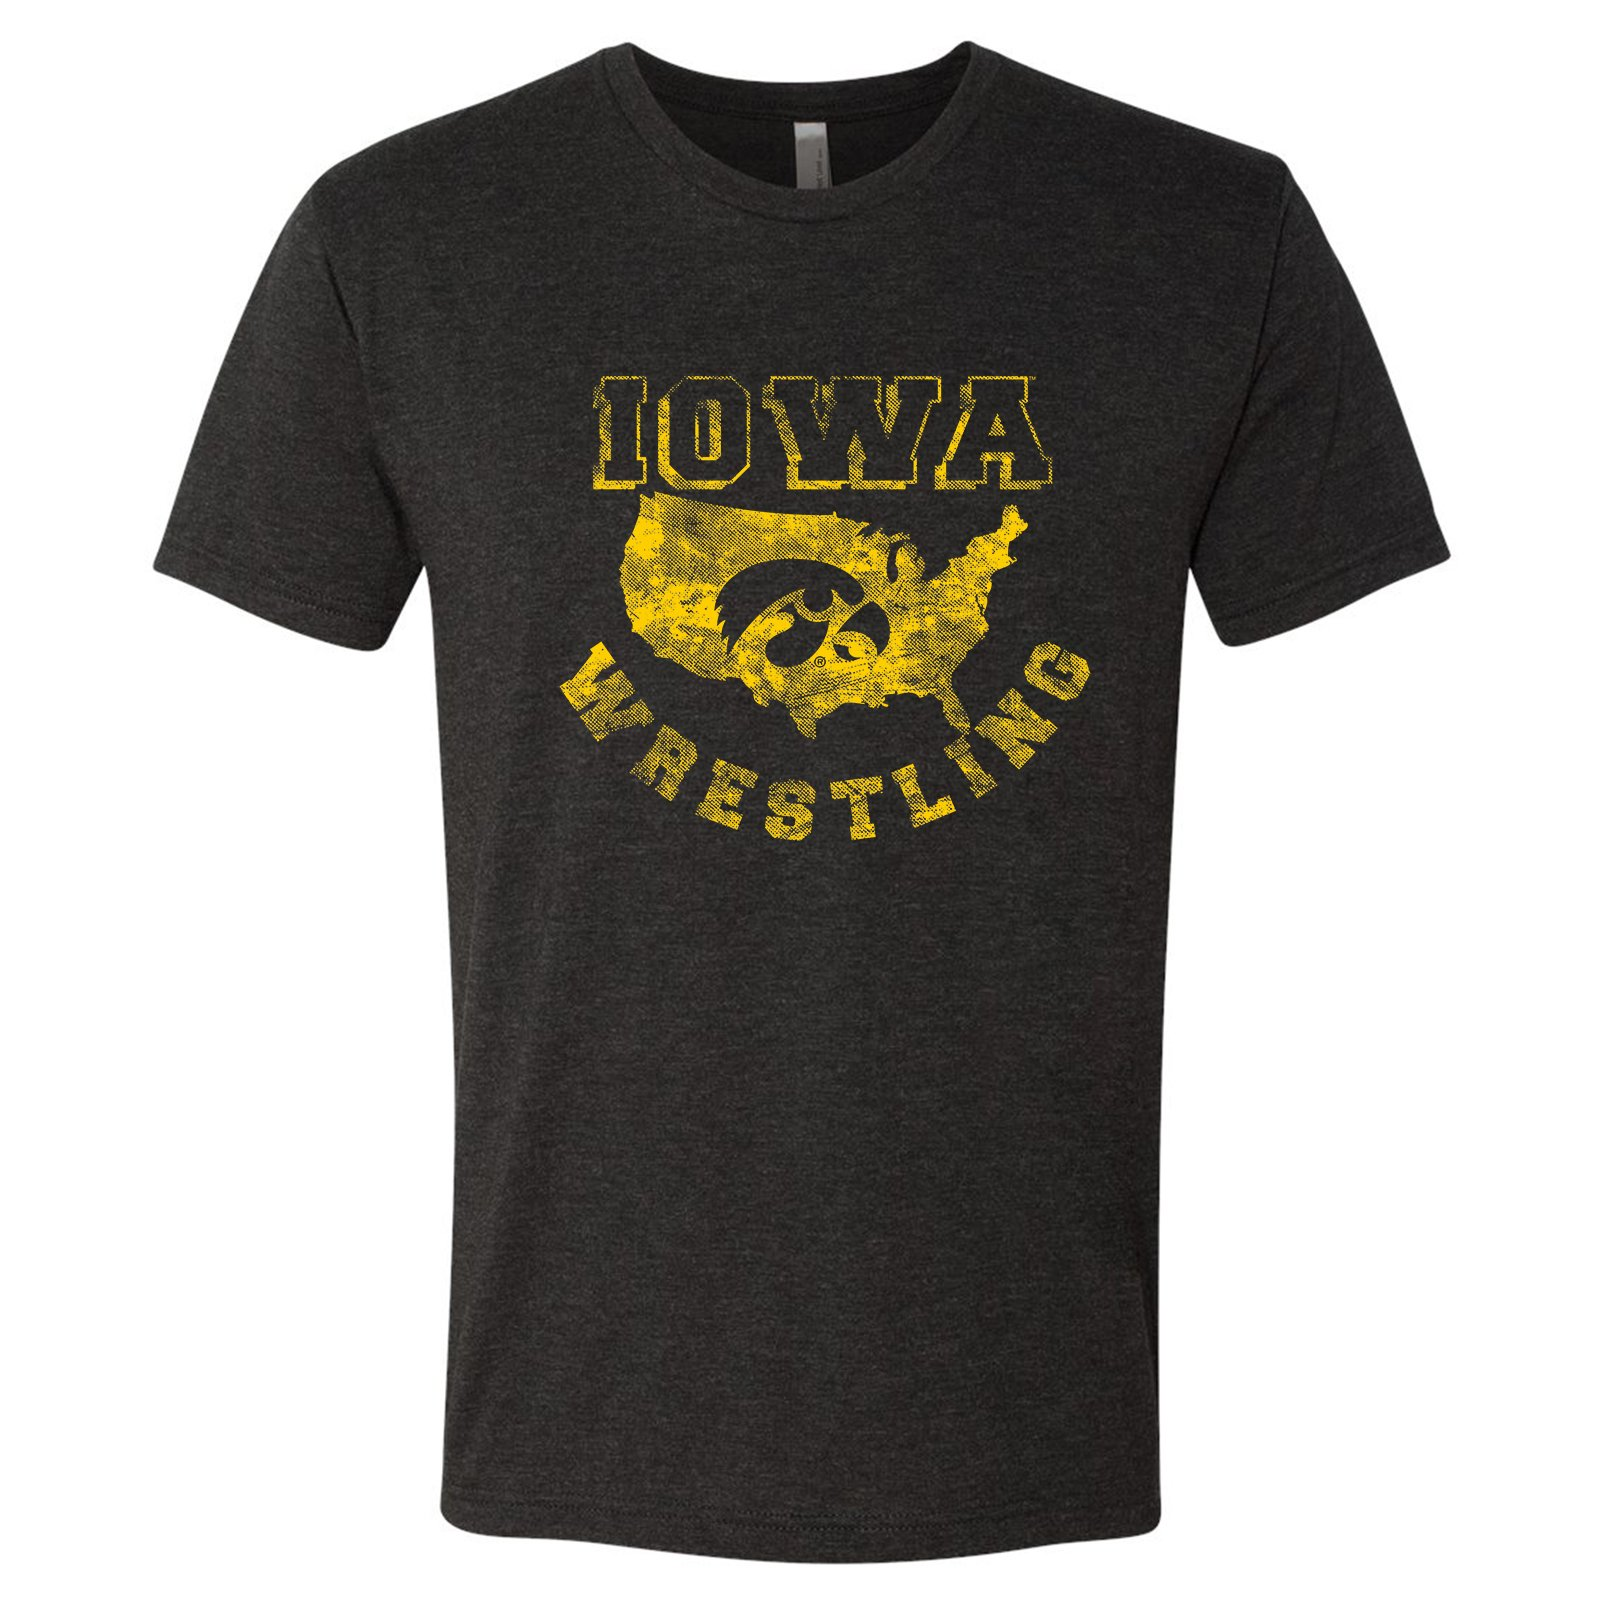 Iowa Hawkeyes USA Wrestling Triblend T Shirt - Medium - Vintage Black by UGP Campus Apparel